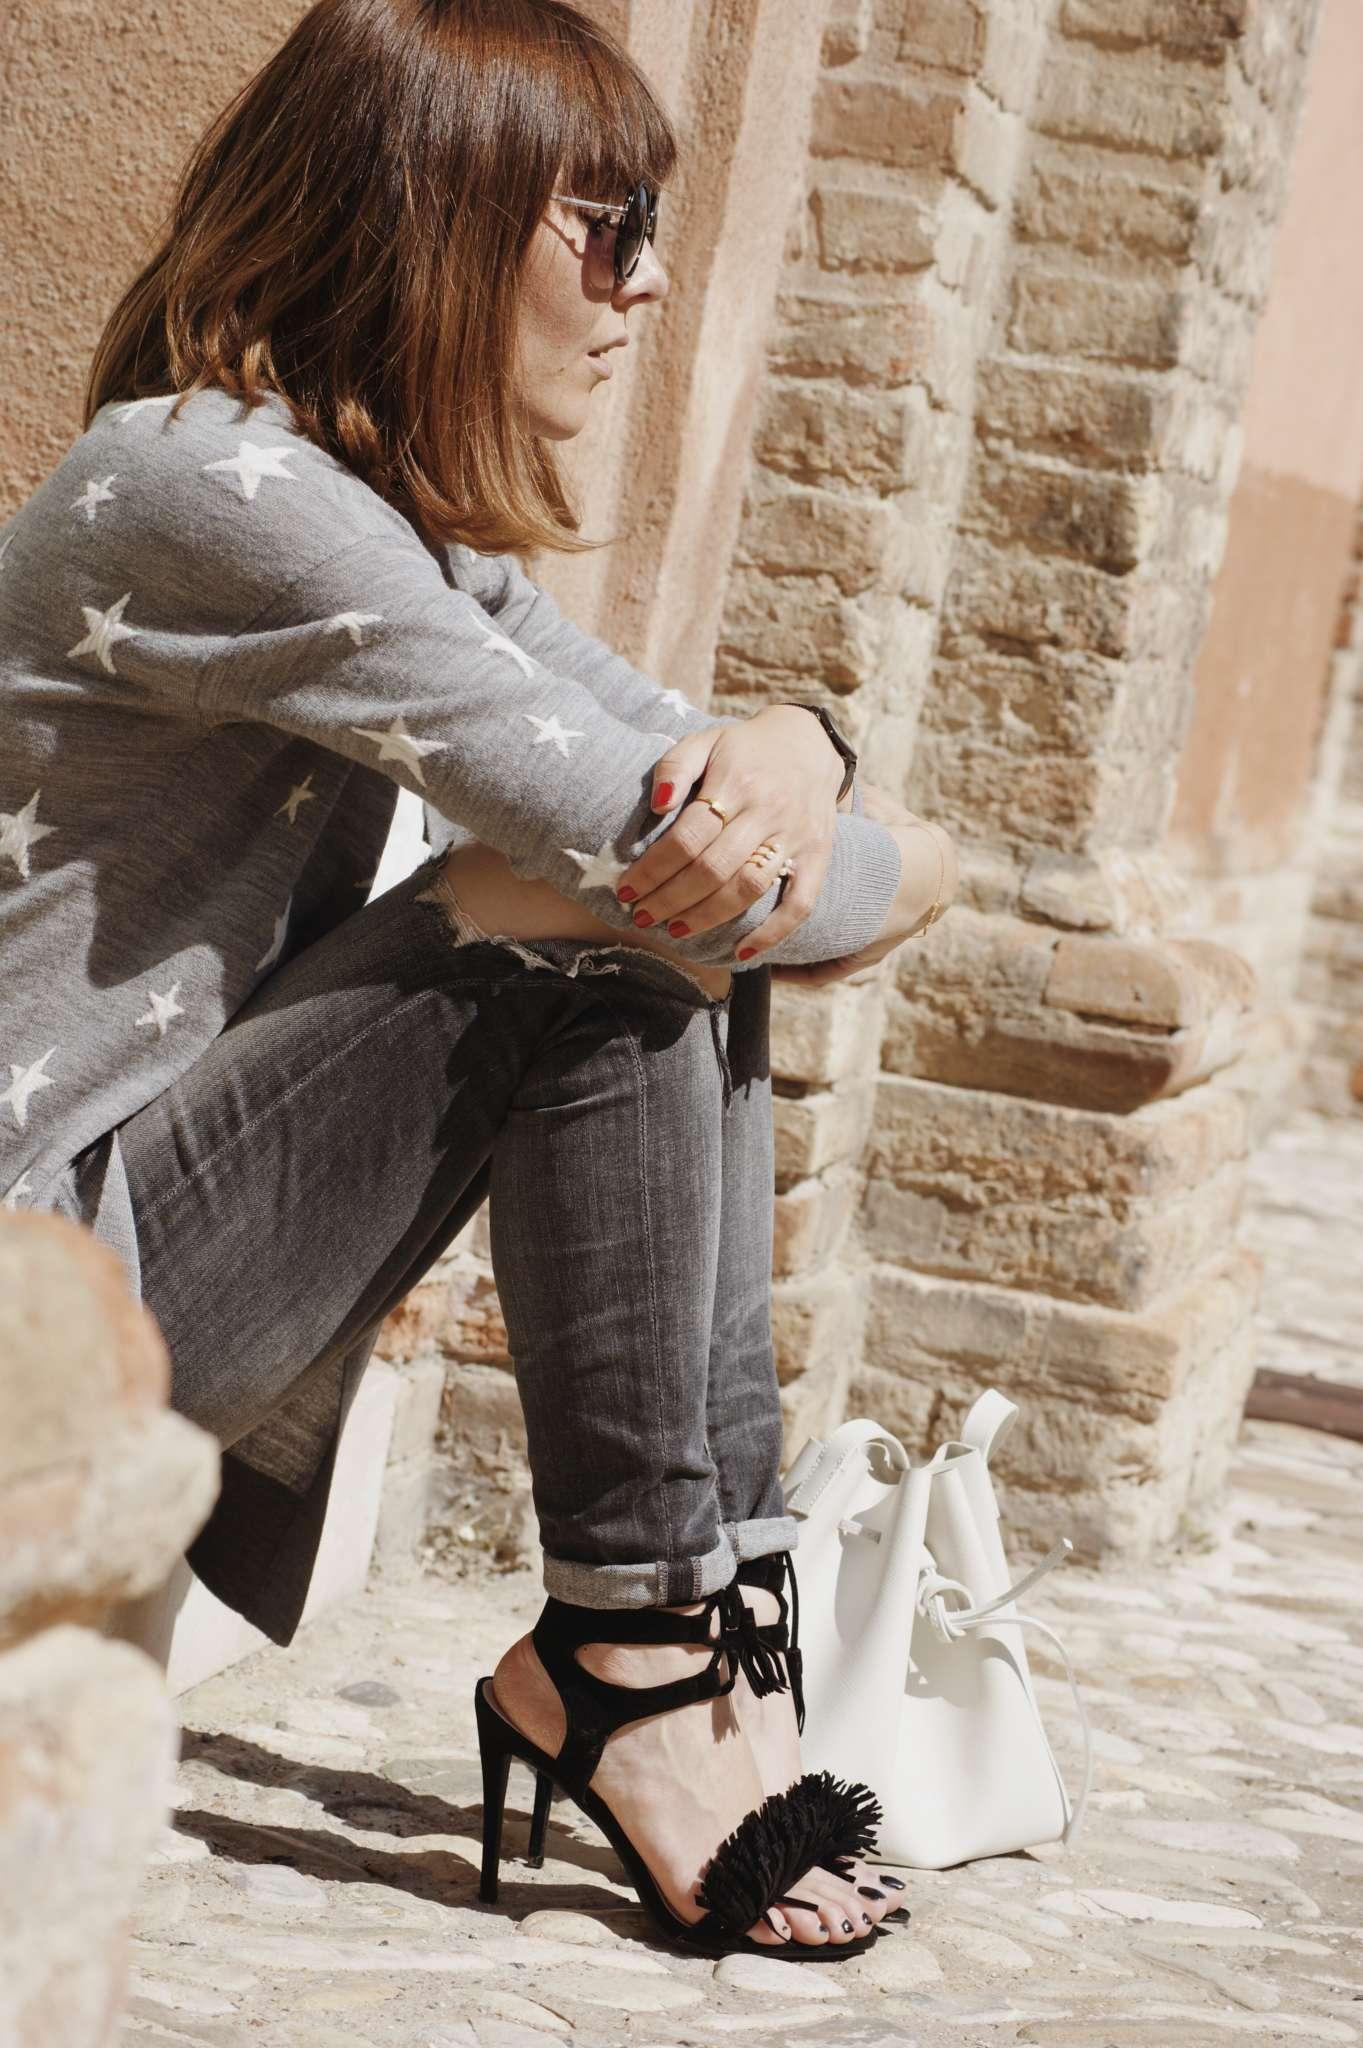 bucket-bag-cardigan-citizenofhumanity-cluse-janekoenig-JewelrybyAd-lancaster-LollysLaundry-LuckyEyes-PUBLIC-DESIRE-skinny-jeans-star-print-stiletto-heels-stylebutler-zerouv